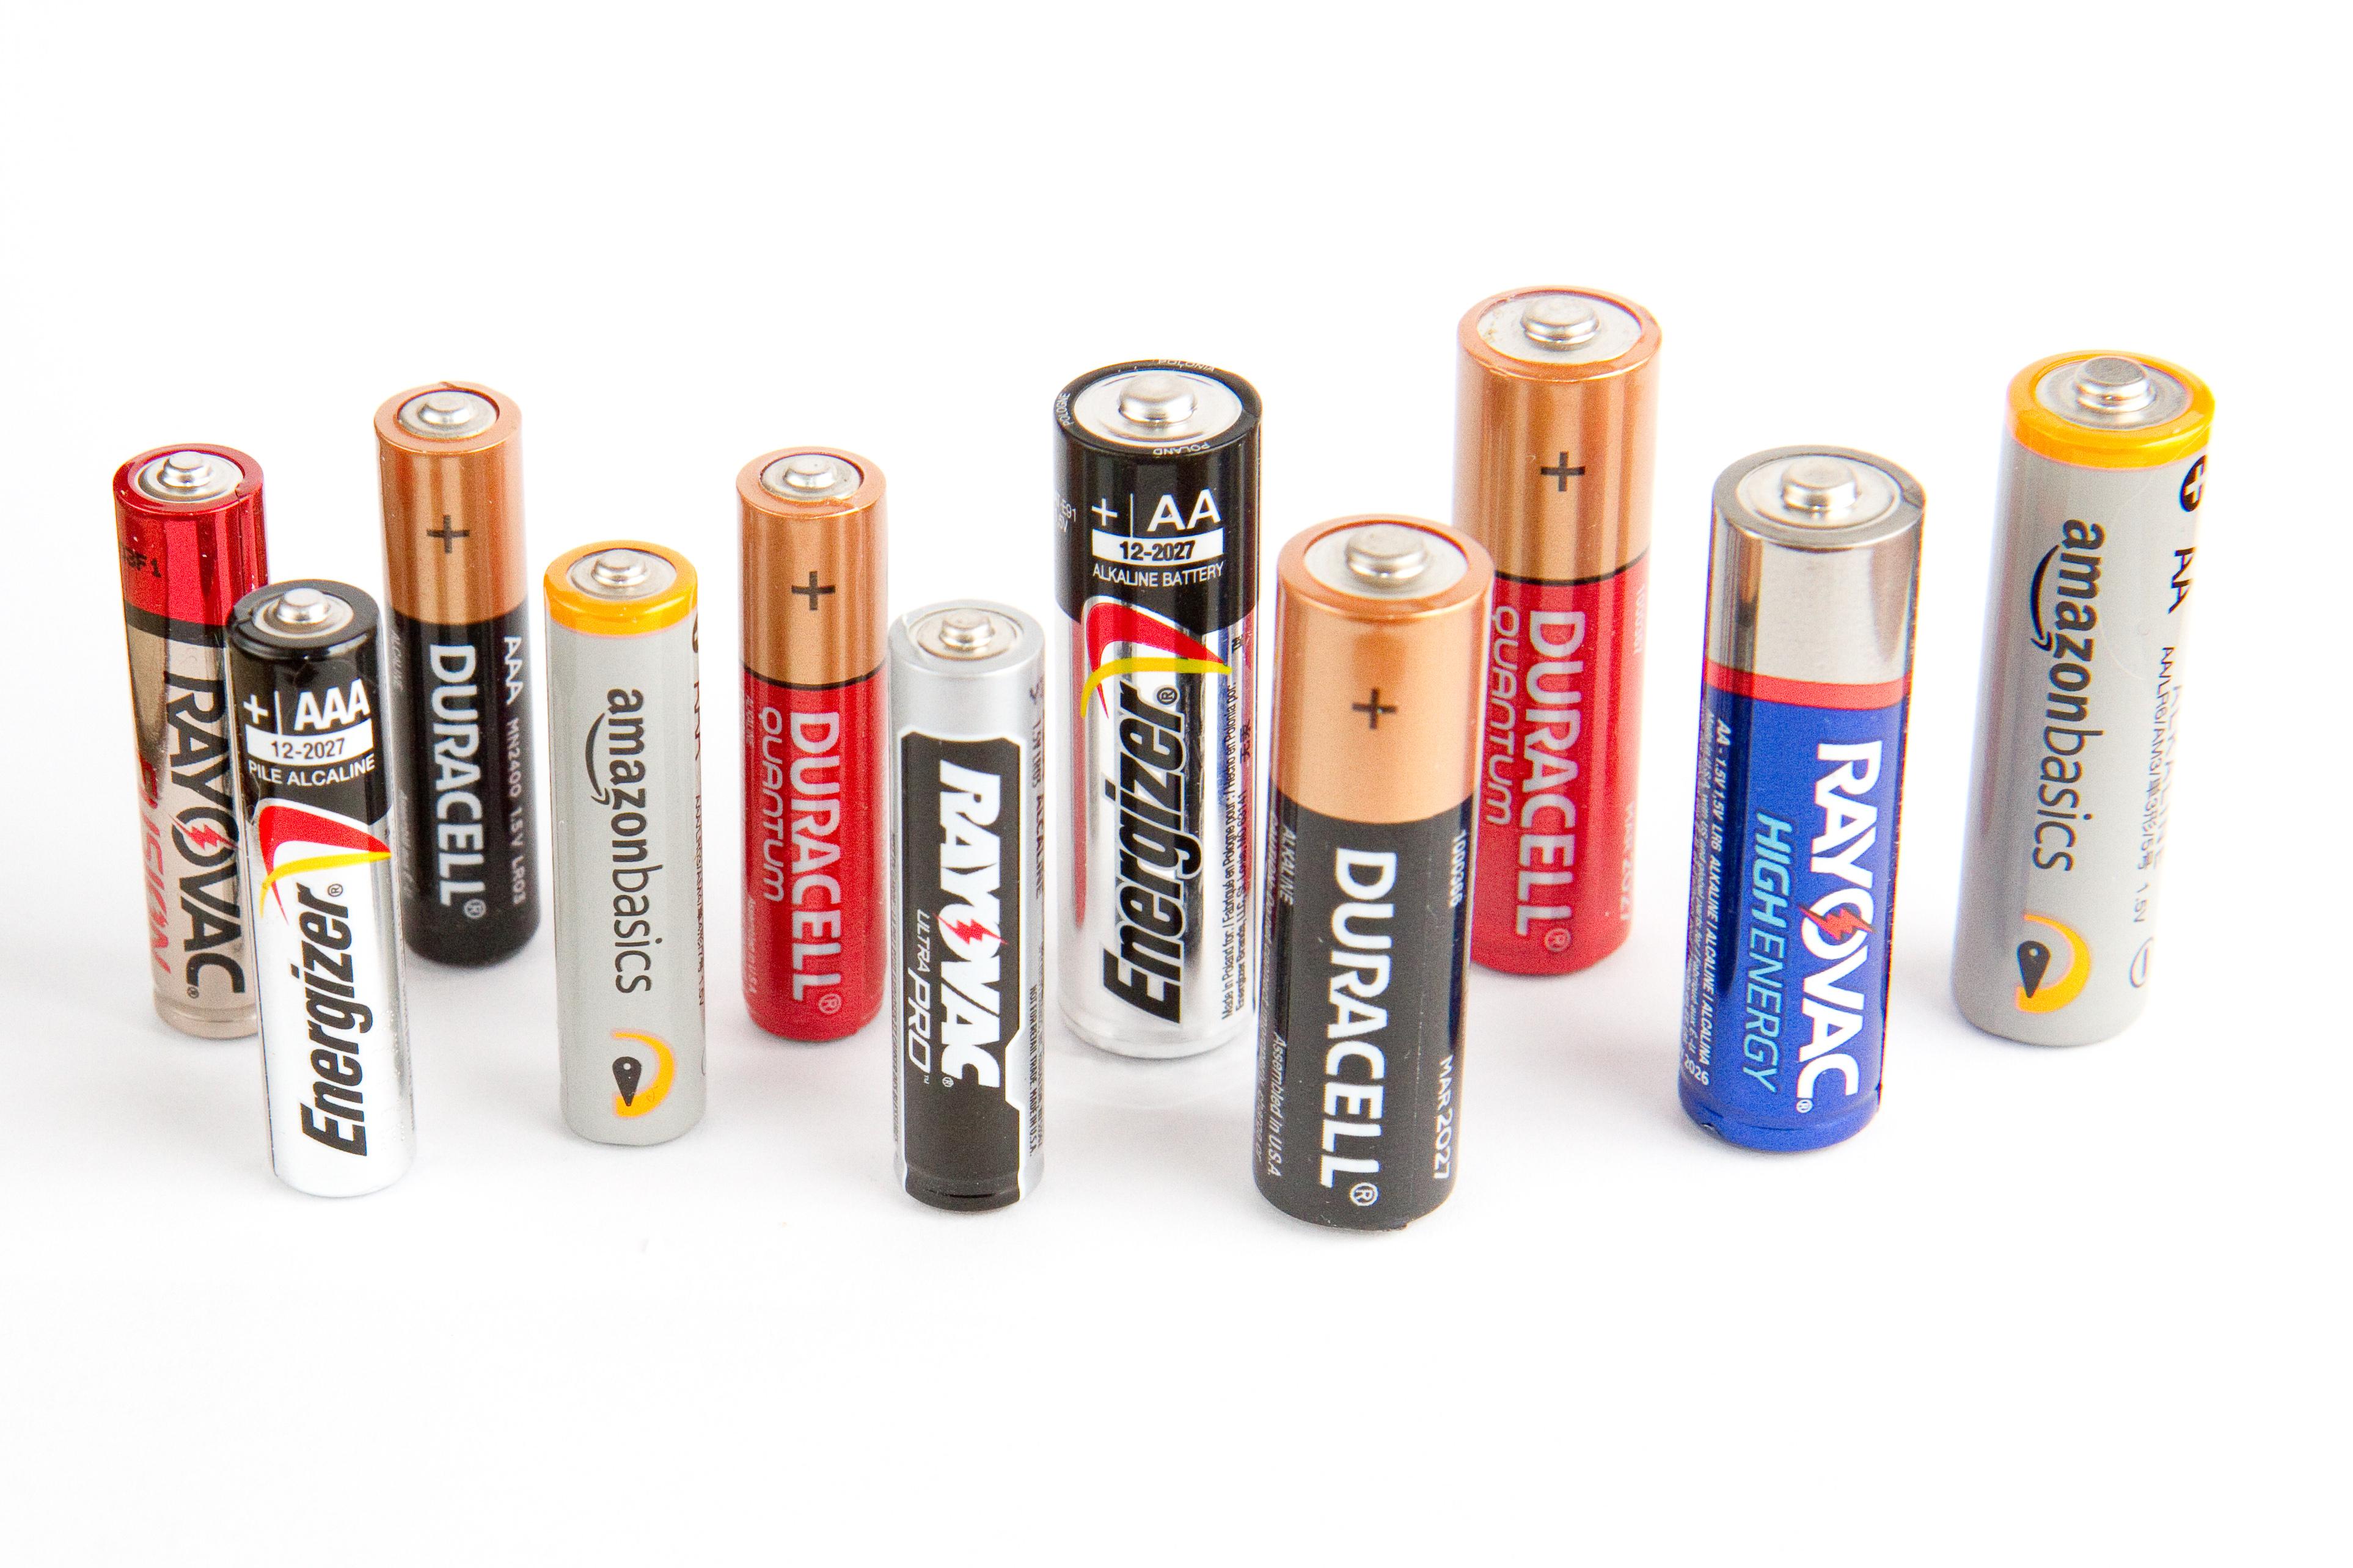 Duracell Car Battery Review >> Keacher Com Are All Alkaline Battery Brands The Same